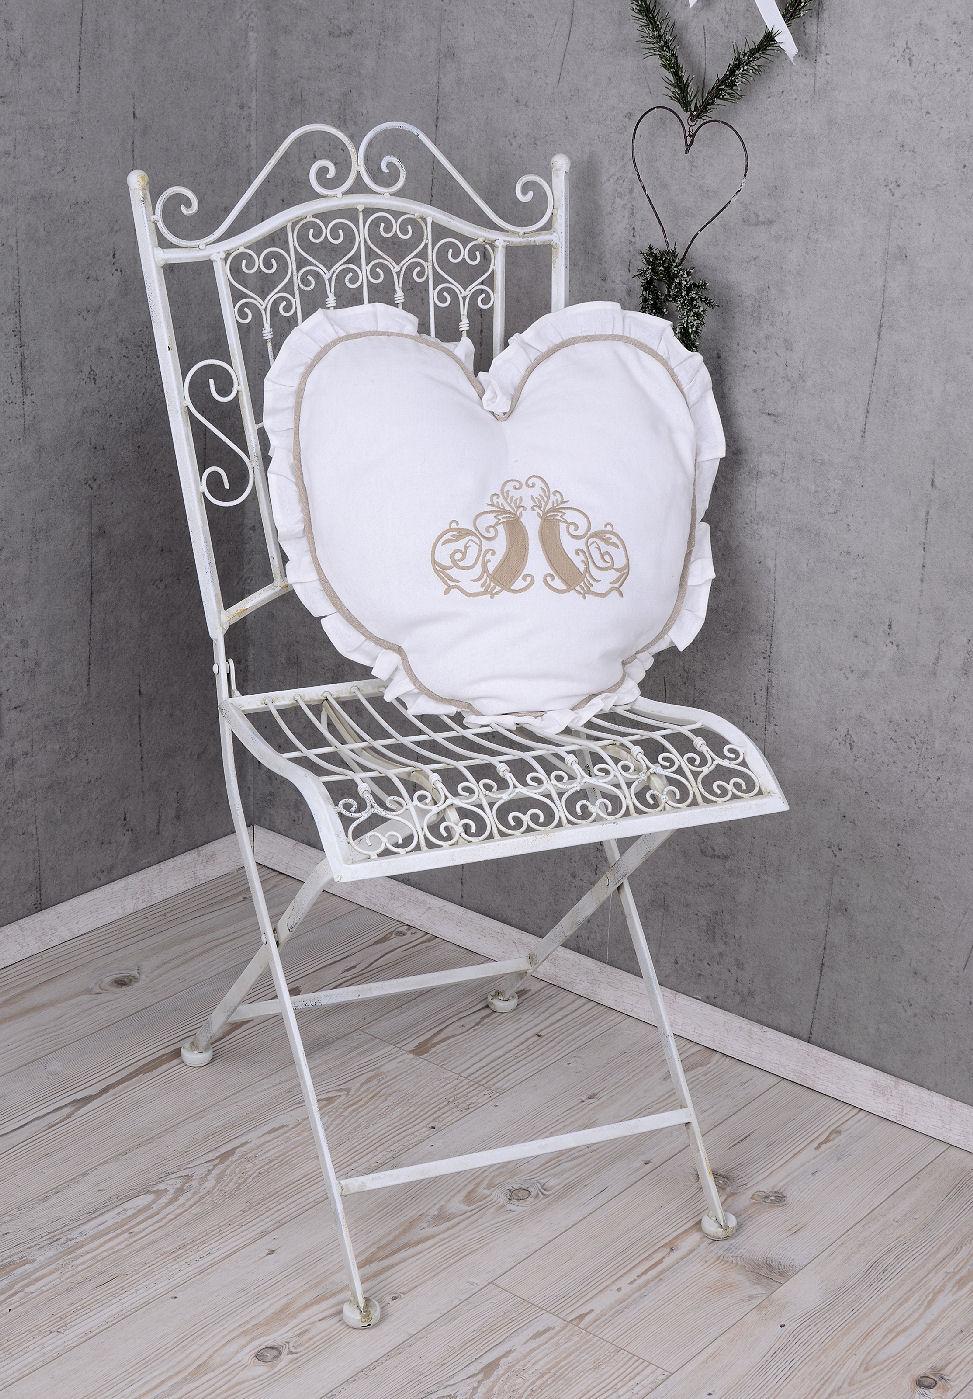 vintage garten stuhl shabby chic gartenstuhl weiss eisenstuhl klappstuhl metall ebay. Black Bedroom Furniture Sets. Home Design Ideas